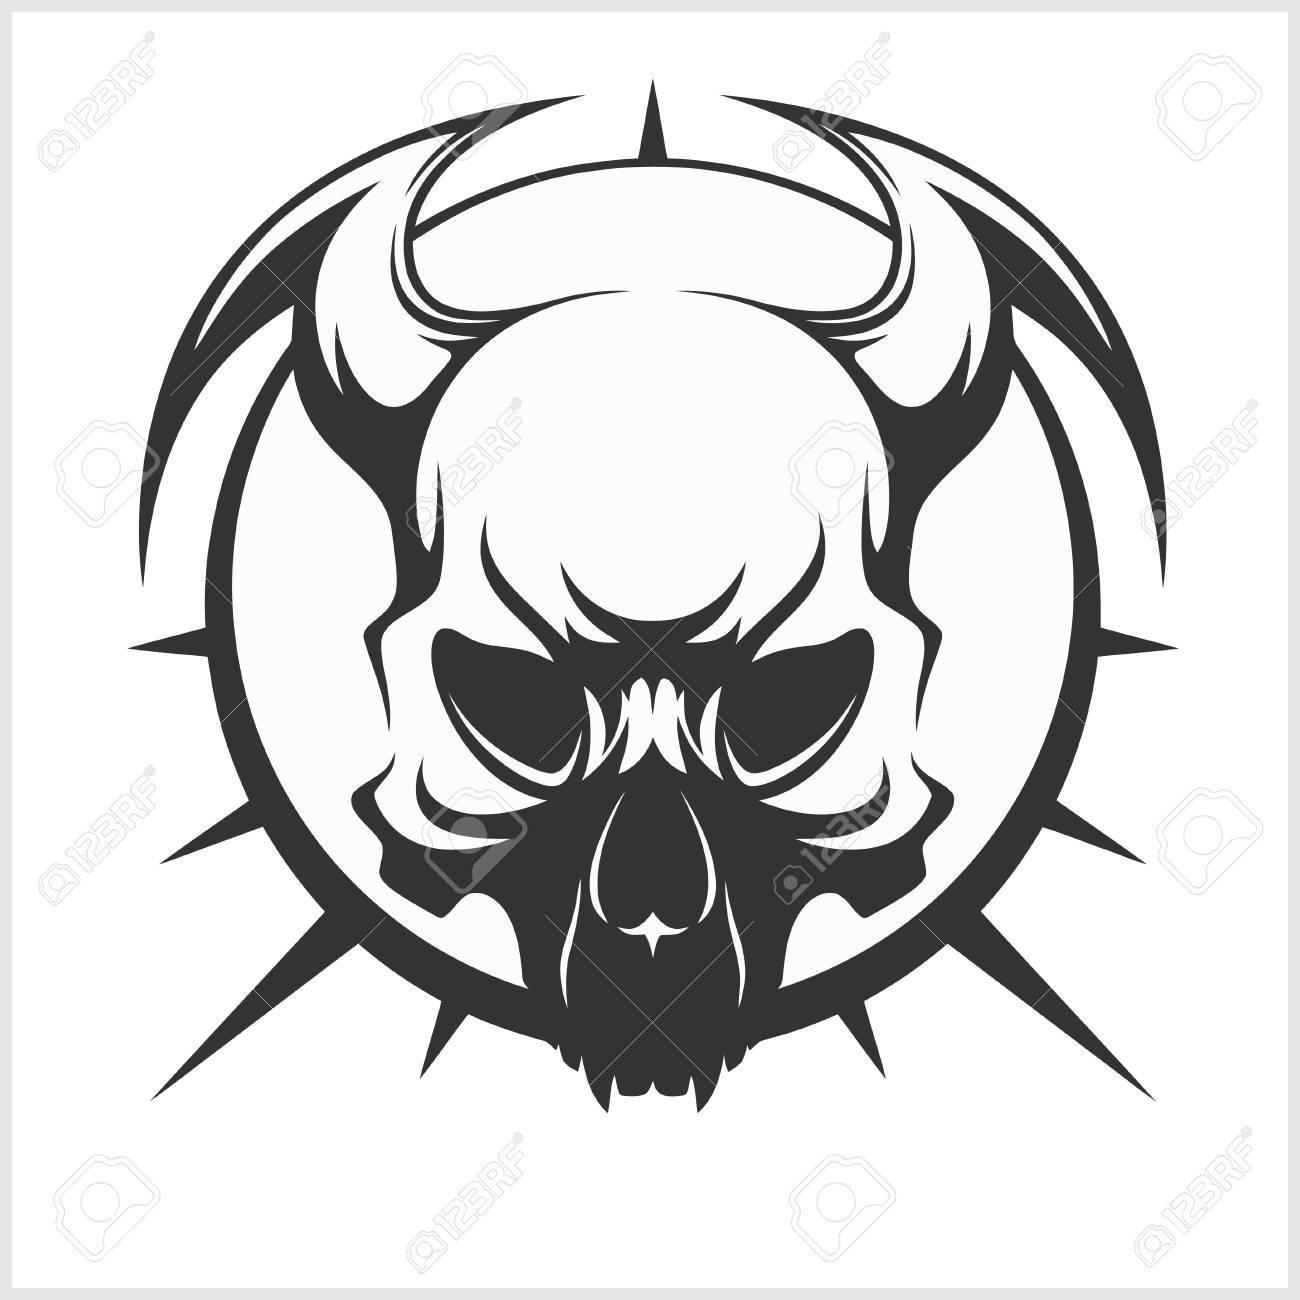 Skull tattoo and tribal design isolated black on white stock vector 58745079